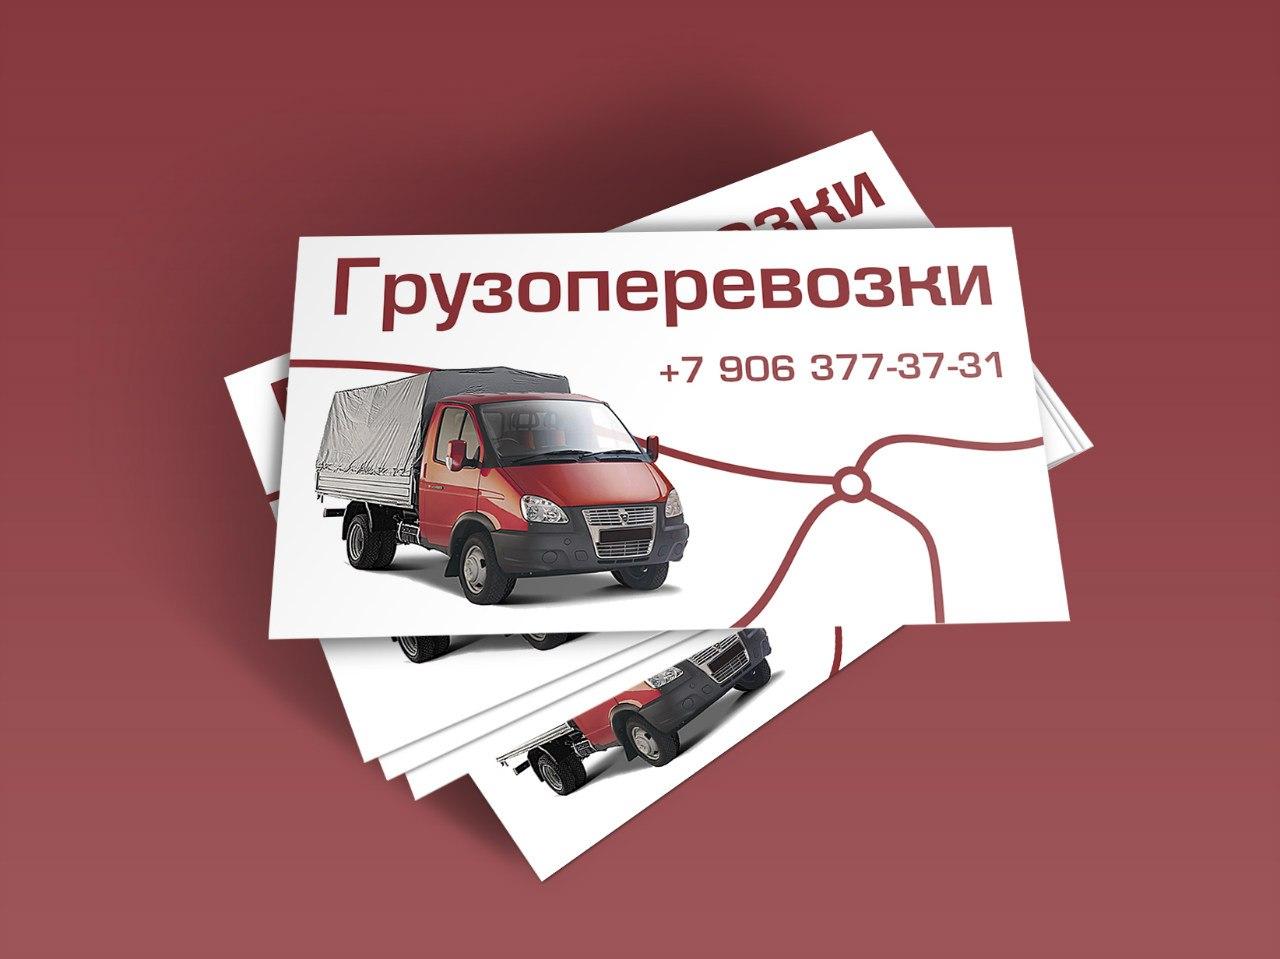 кремль подробнее грузоперевозки картинки для визиток для пошива легких